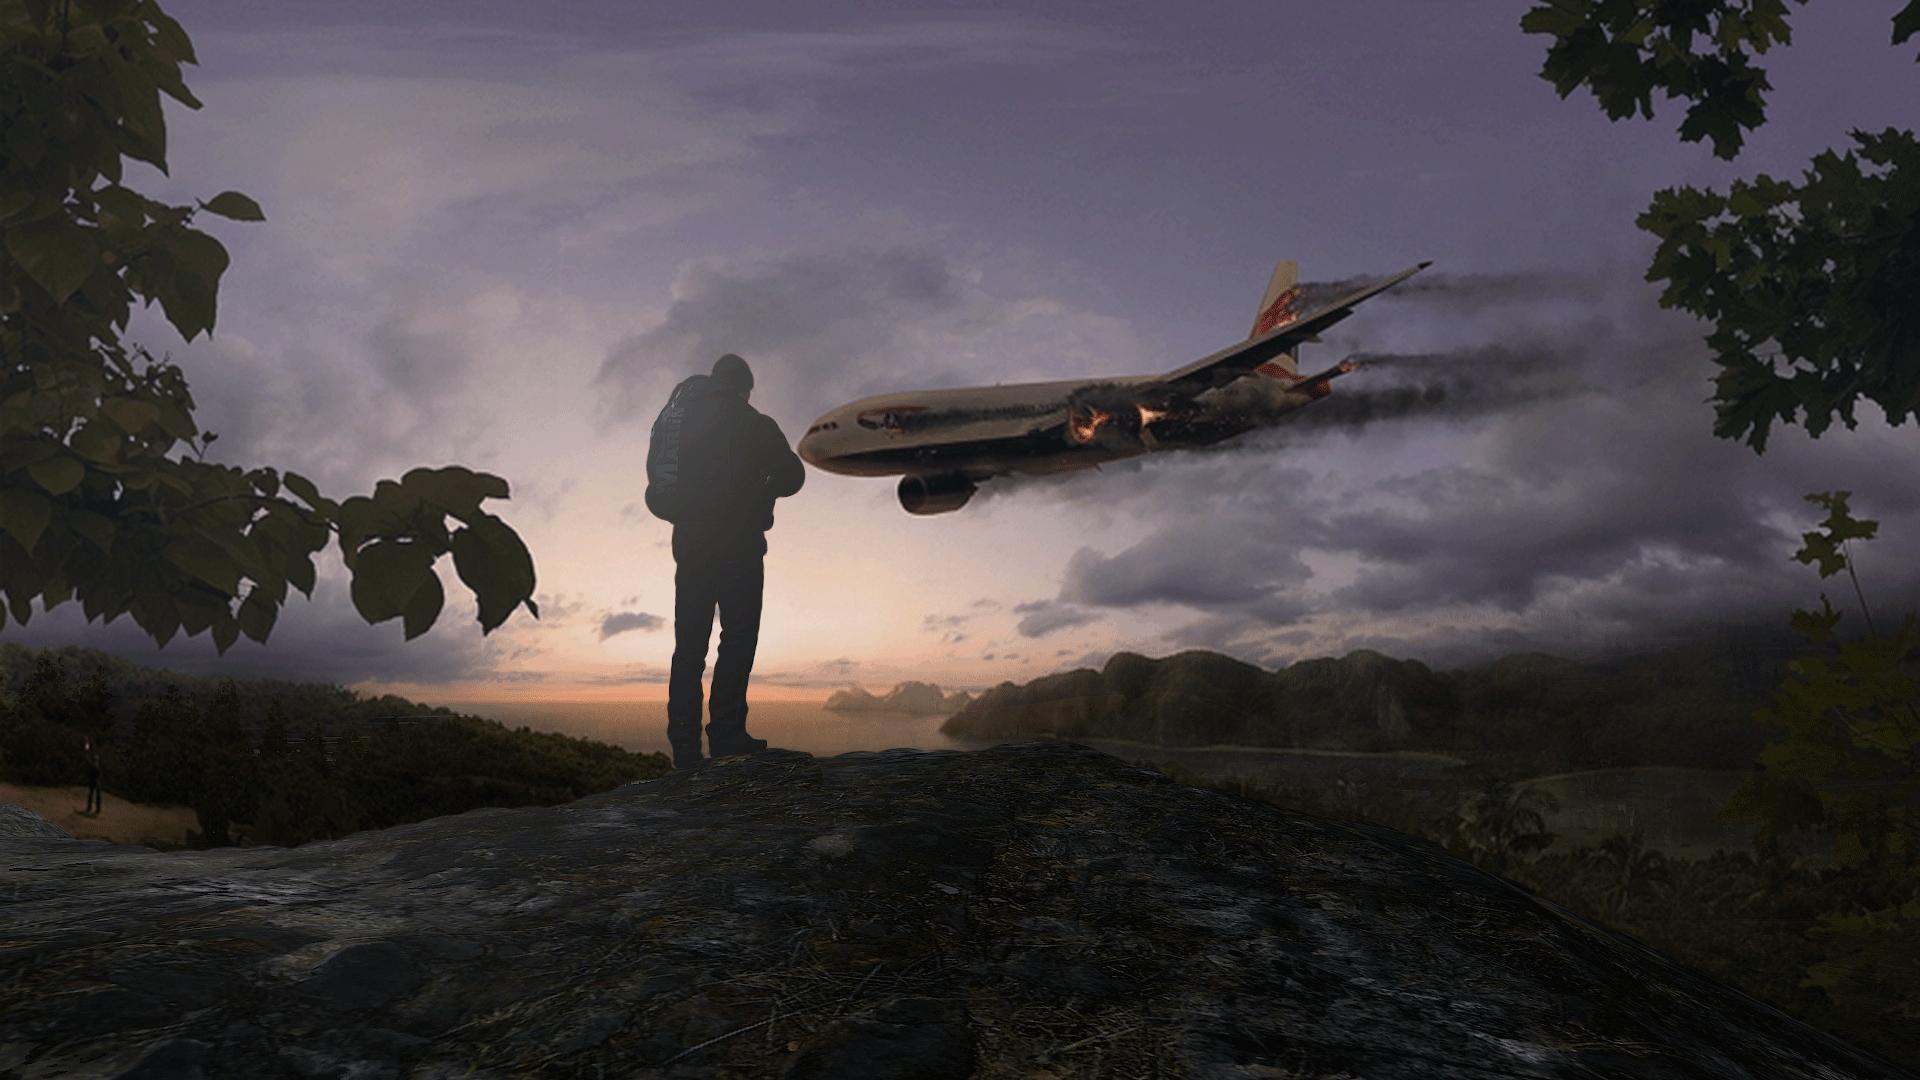 психологи об авиакатастрофе во сне